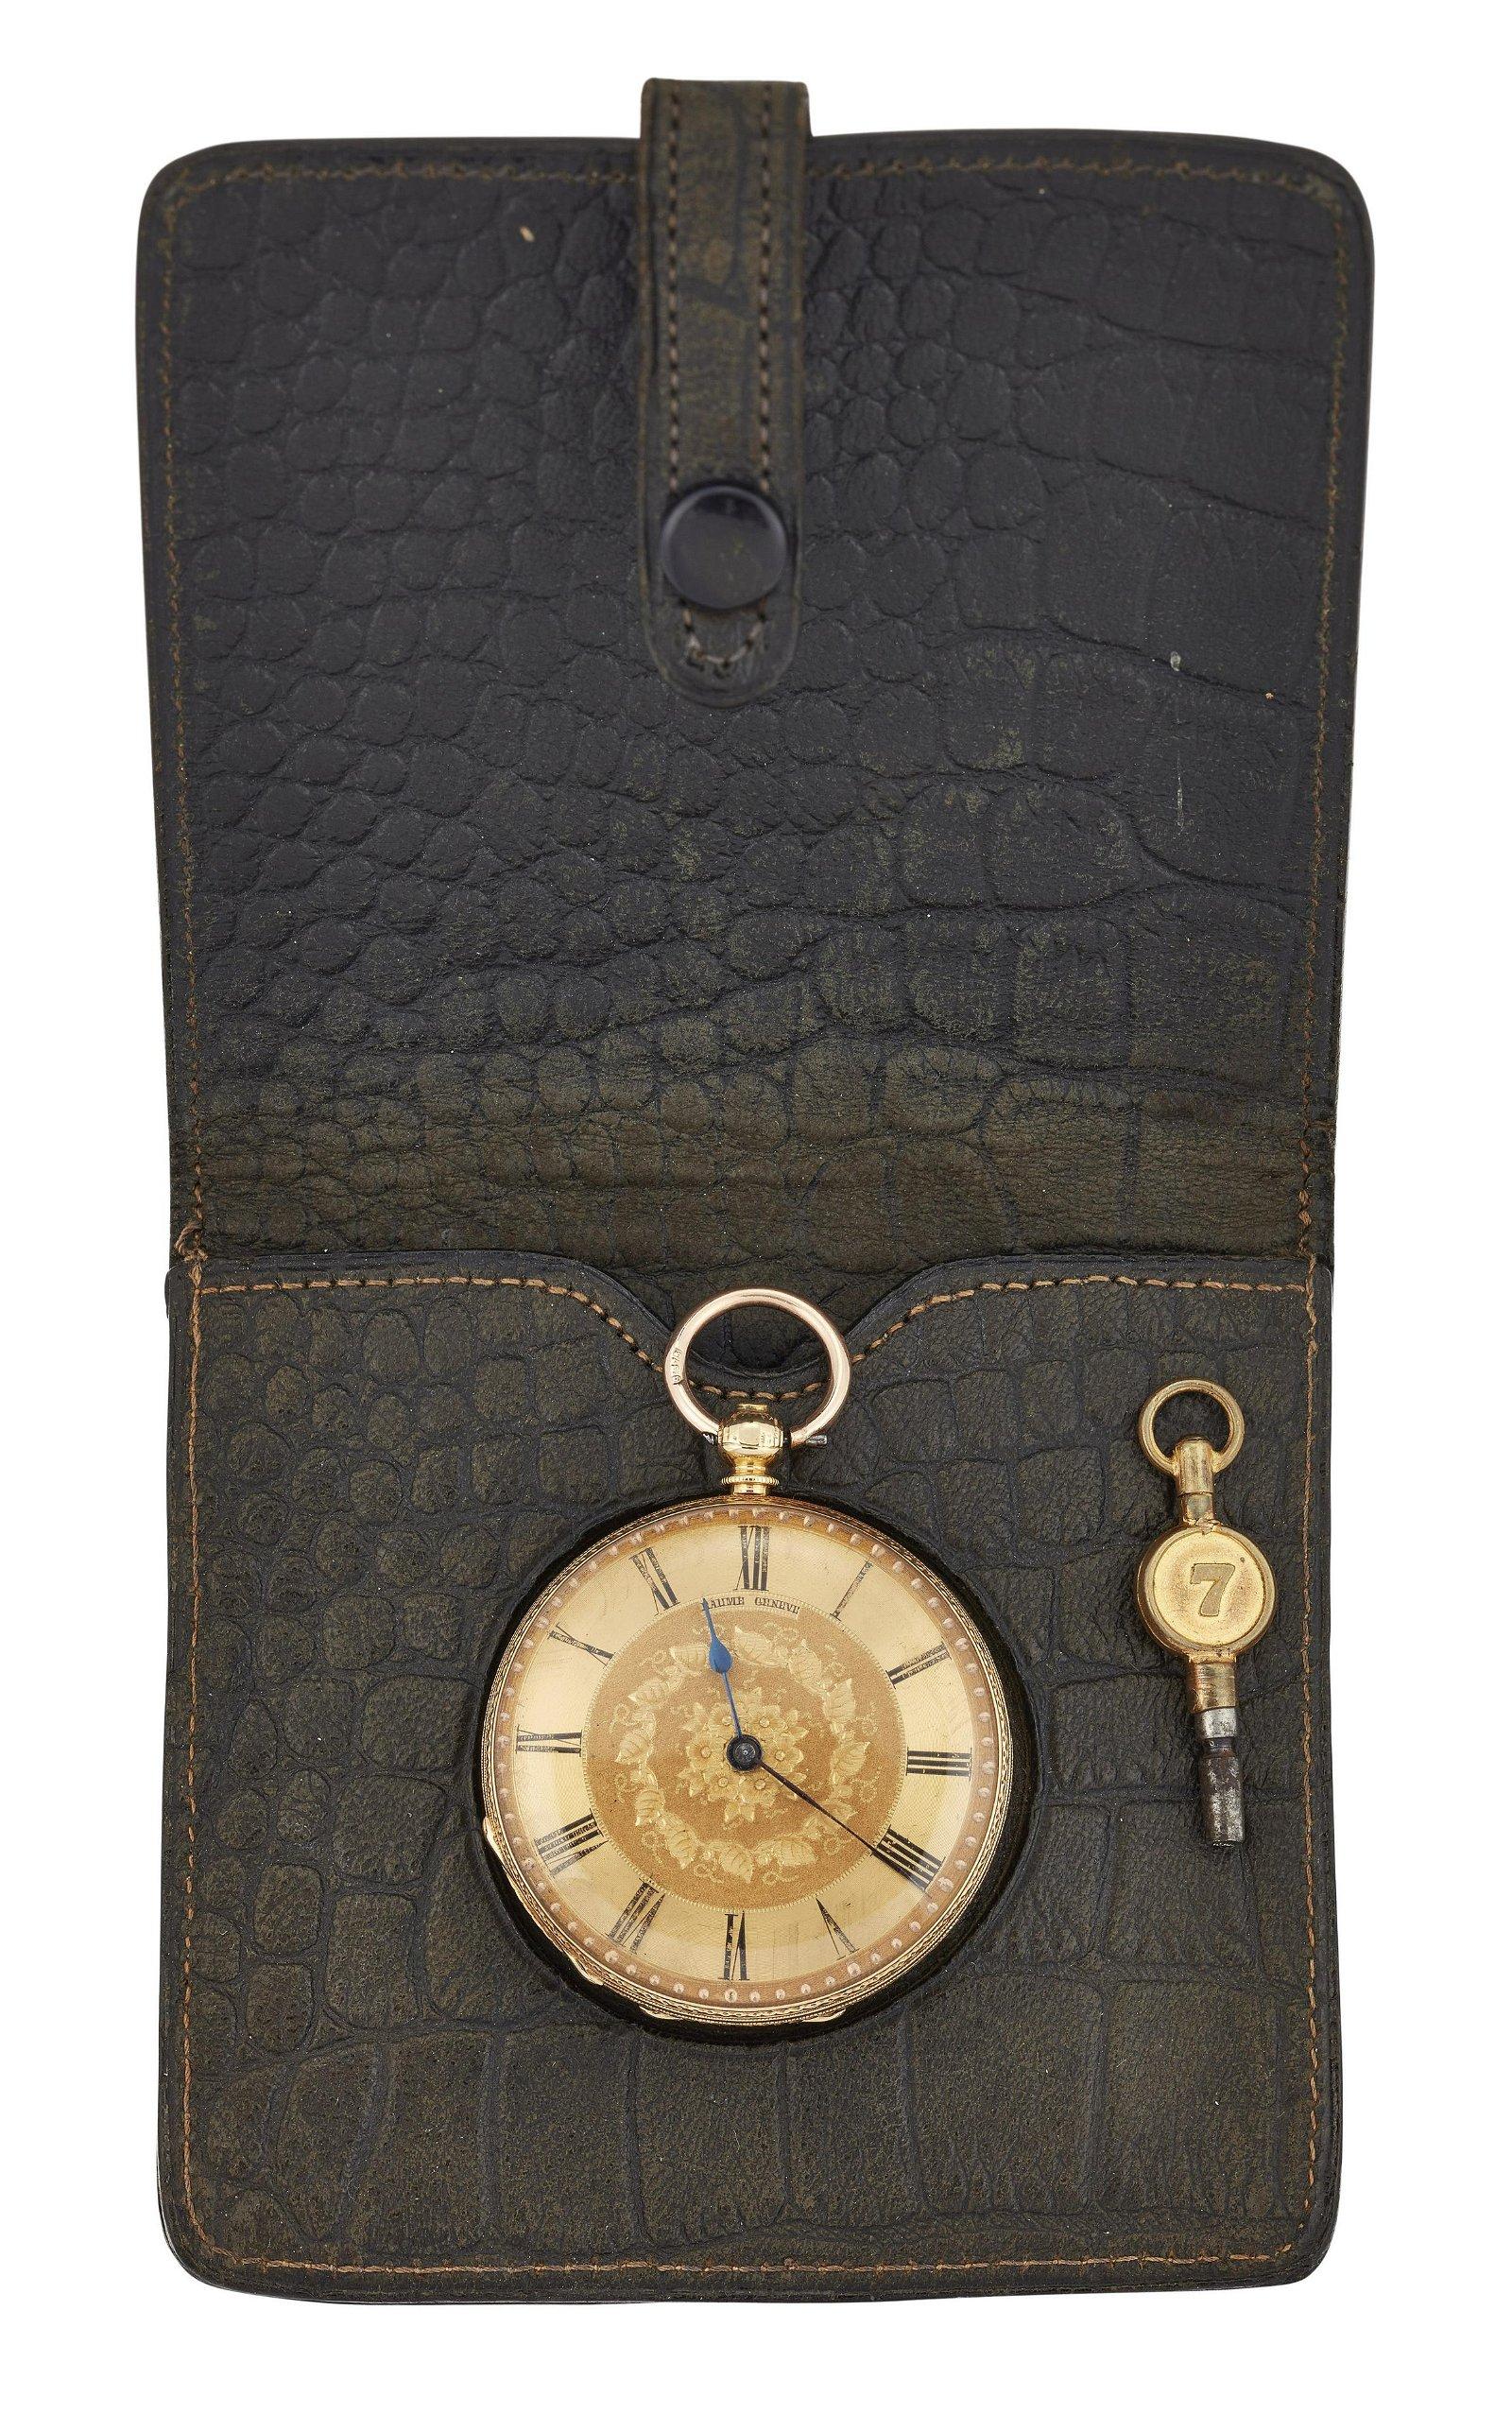 AN 18K GOLD BAUME POCKET WATCH, circular gilt dial